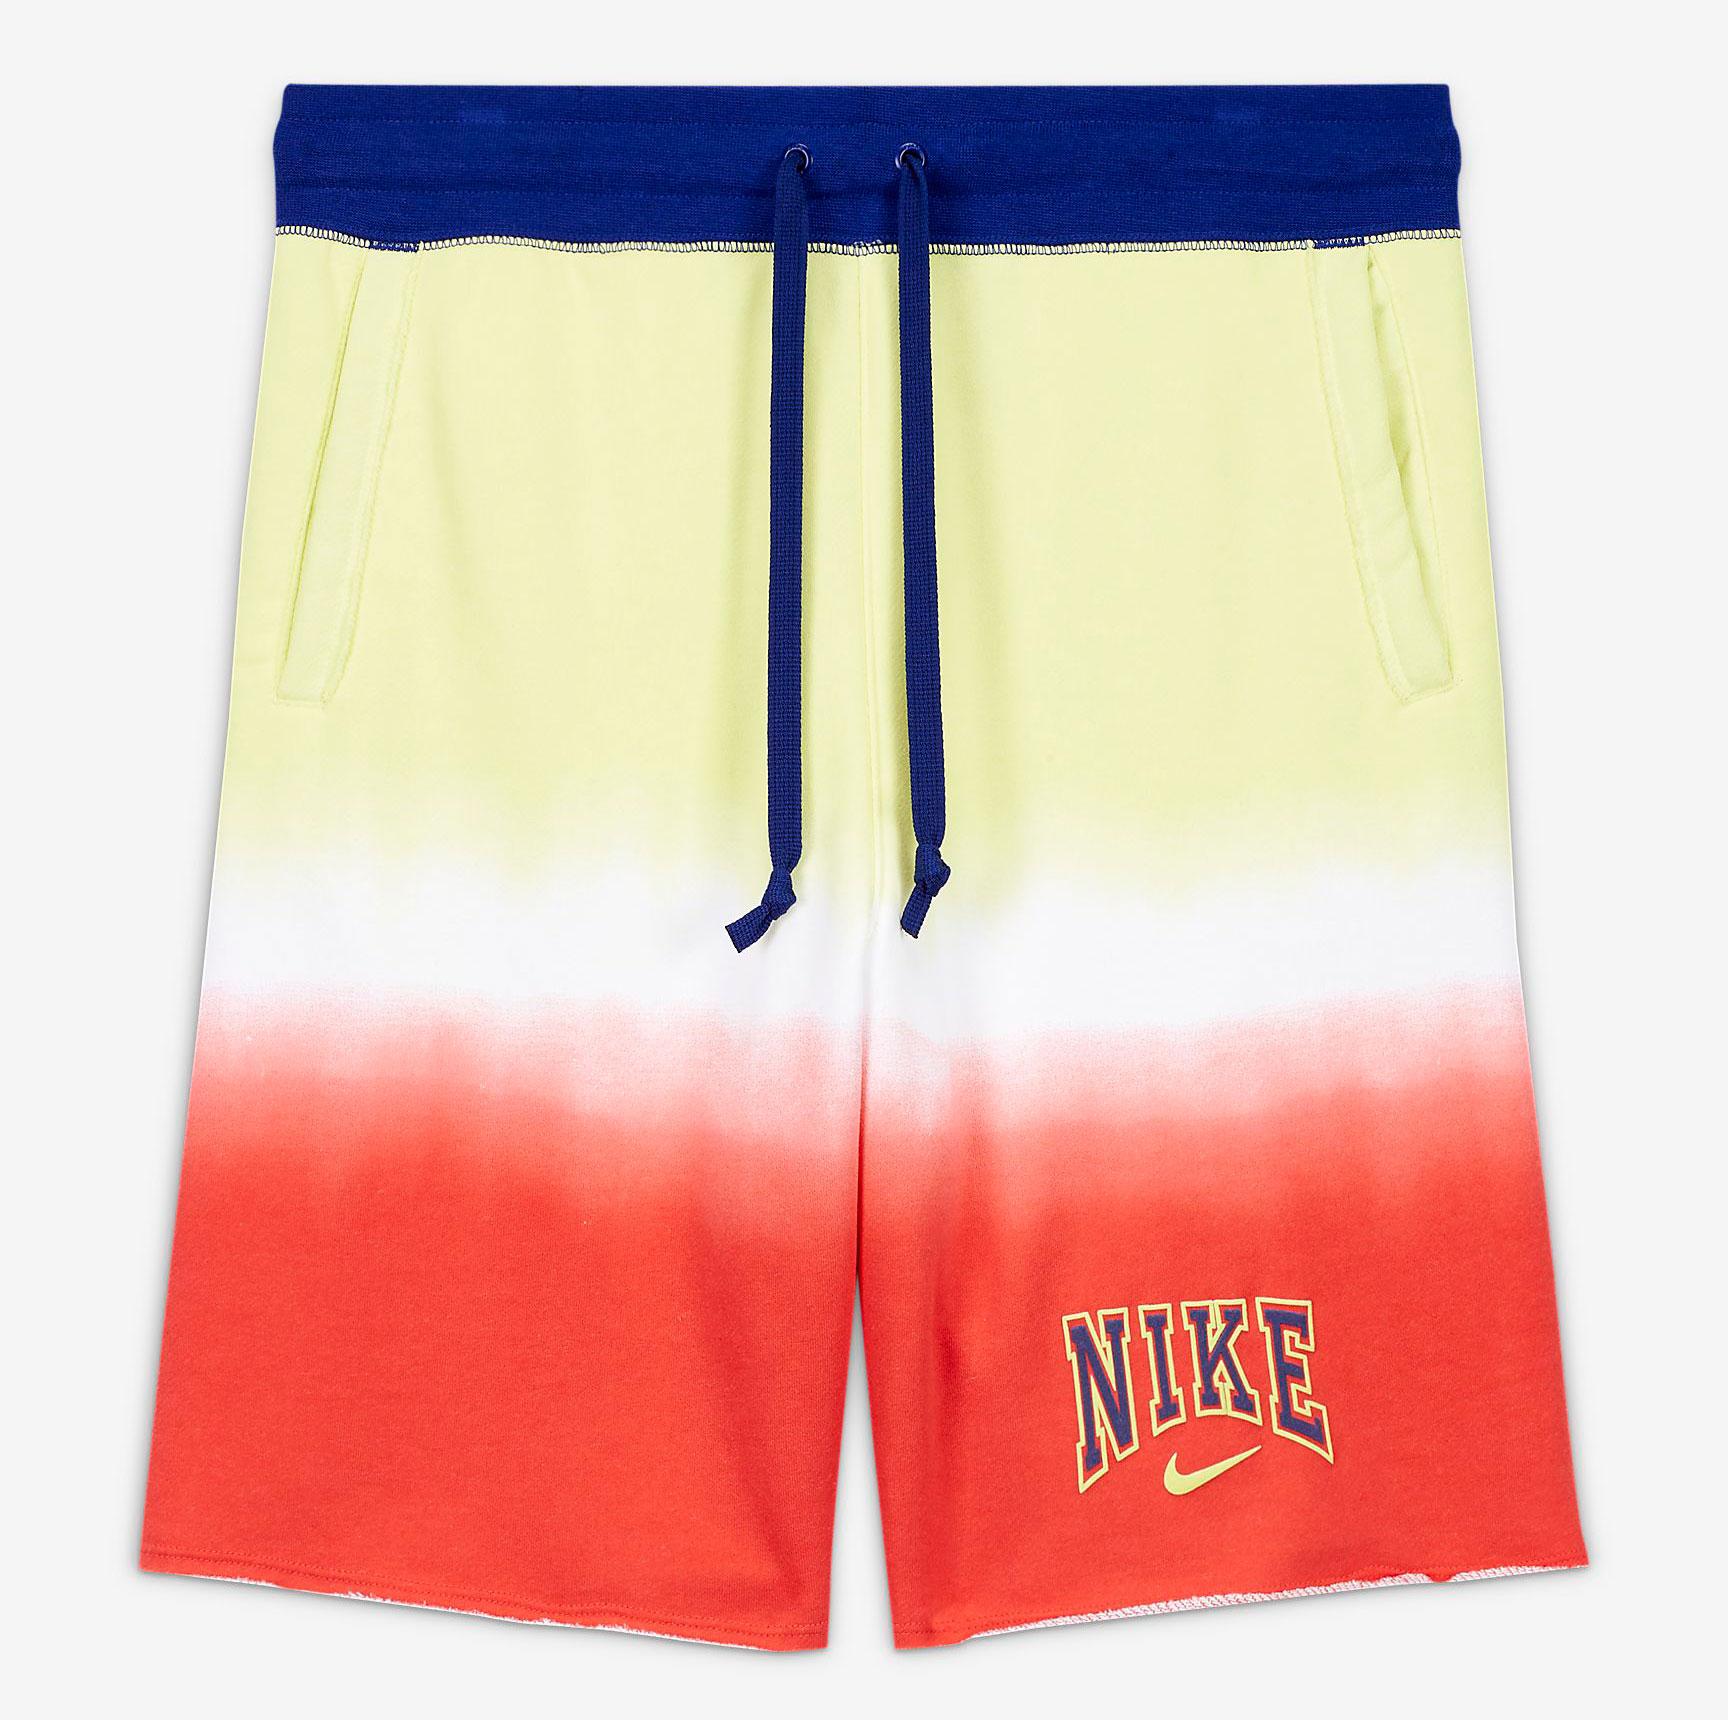 nike-alumni-americana-usa-tie-dye-shorts-1